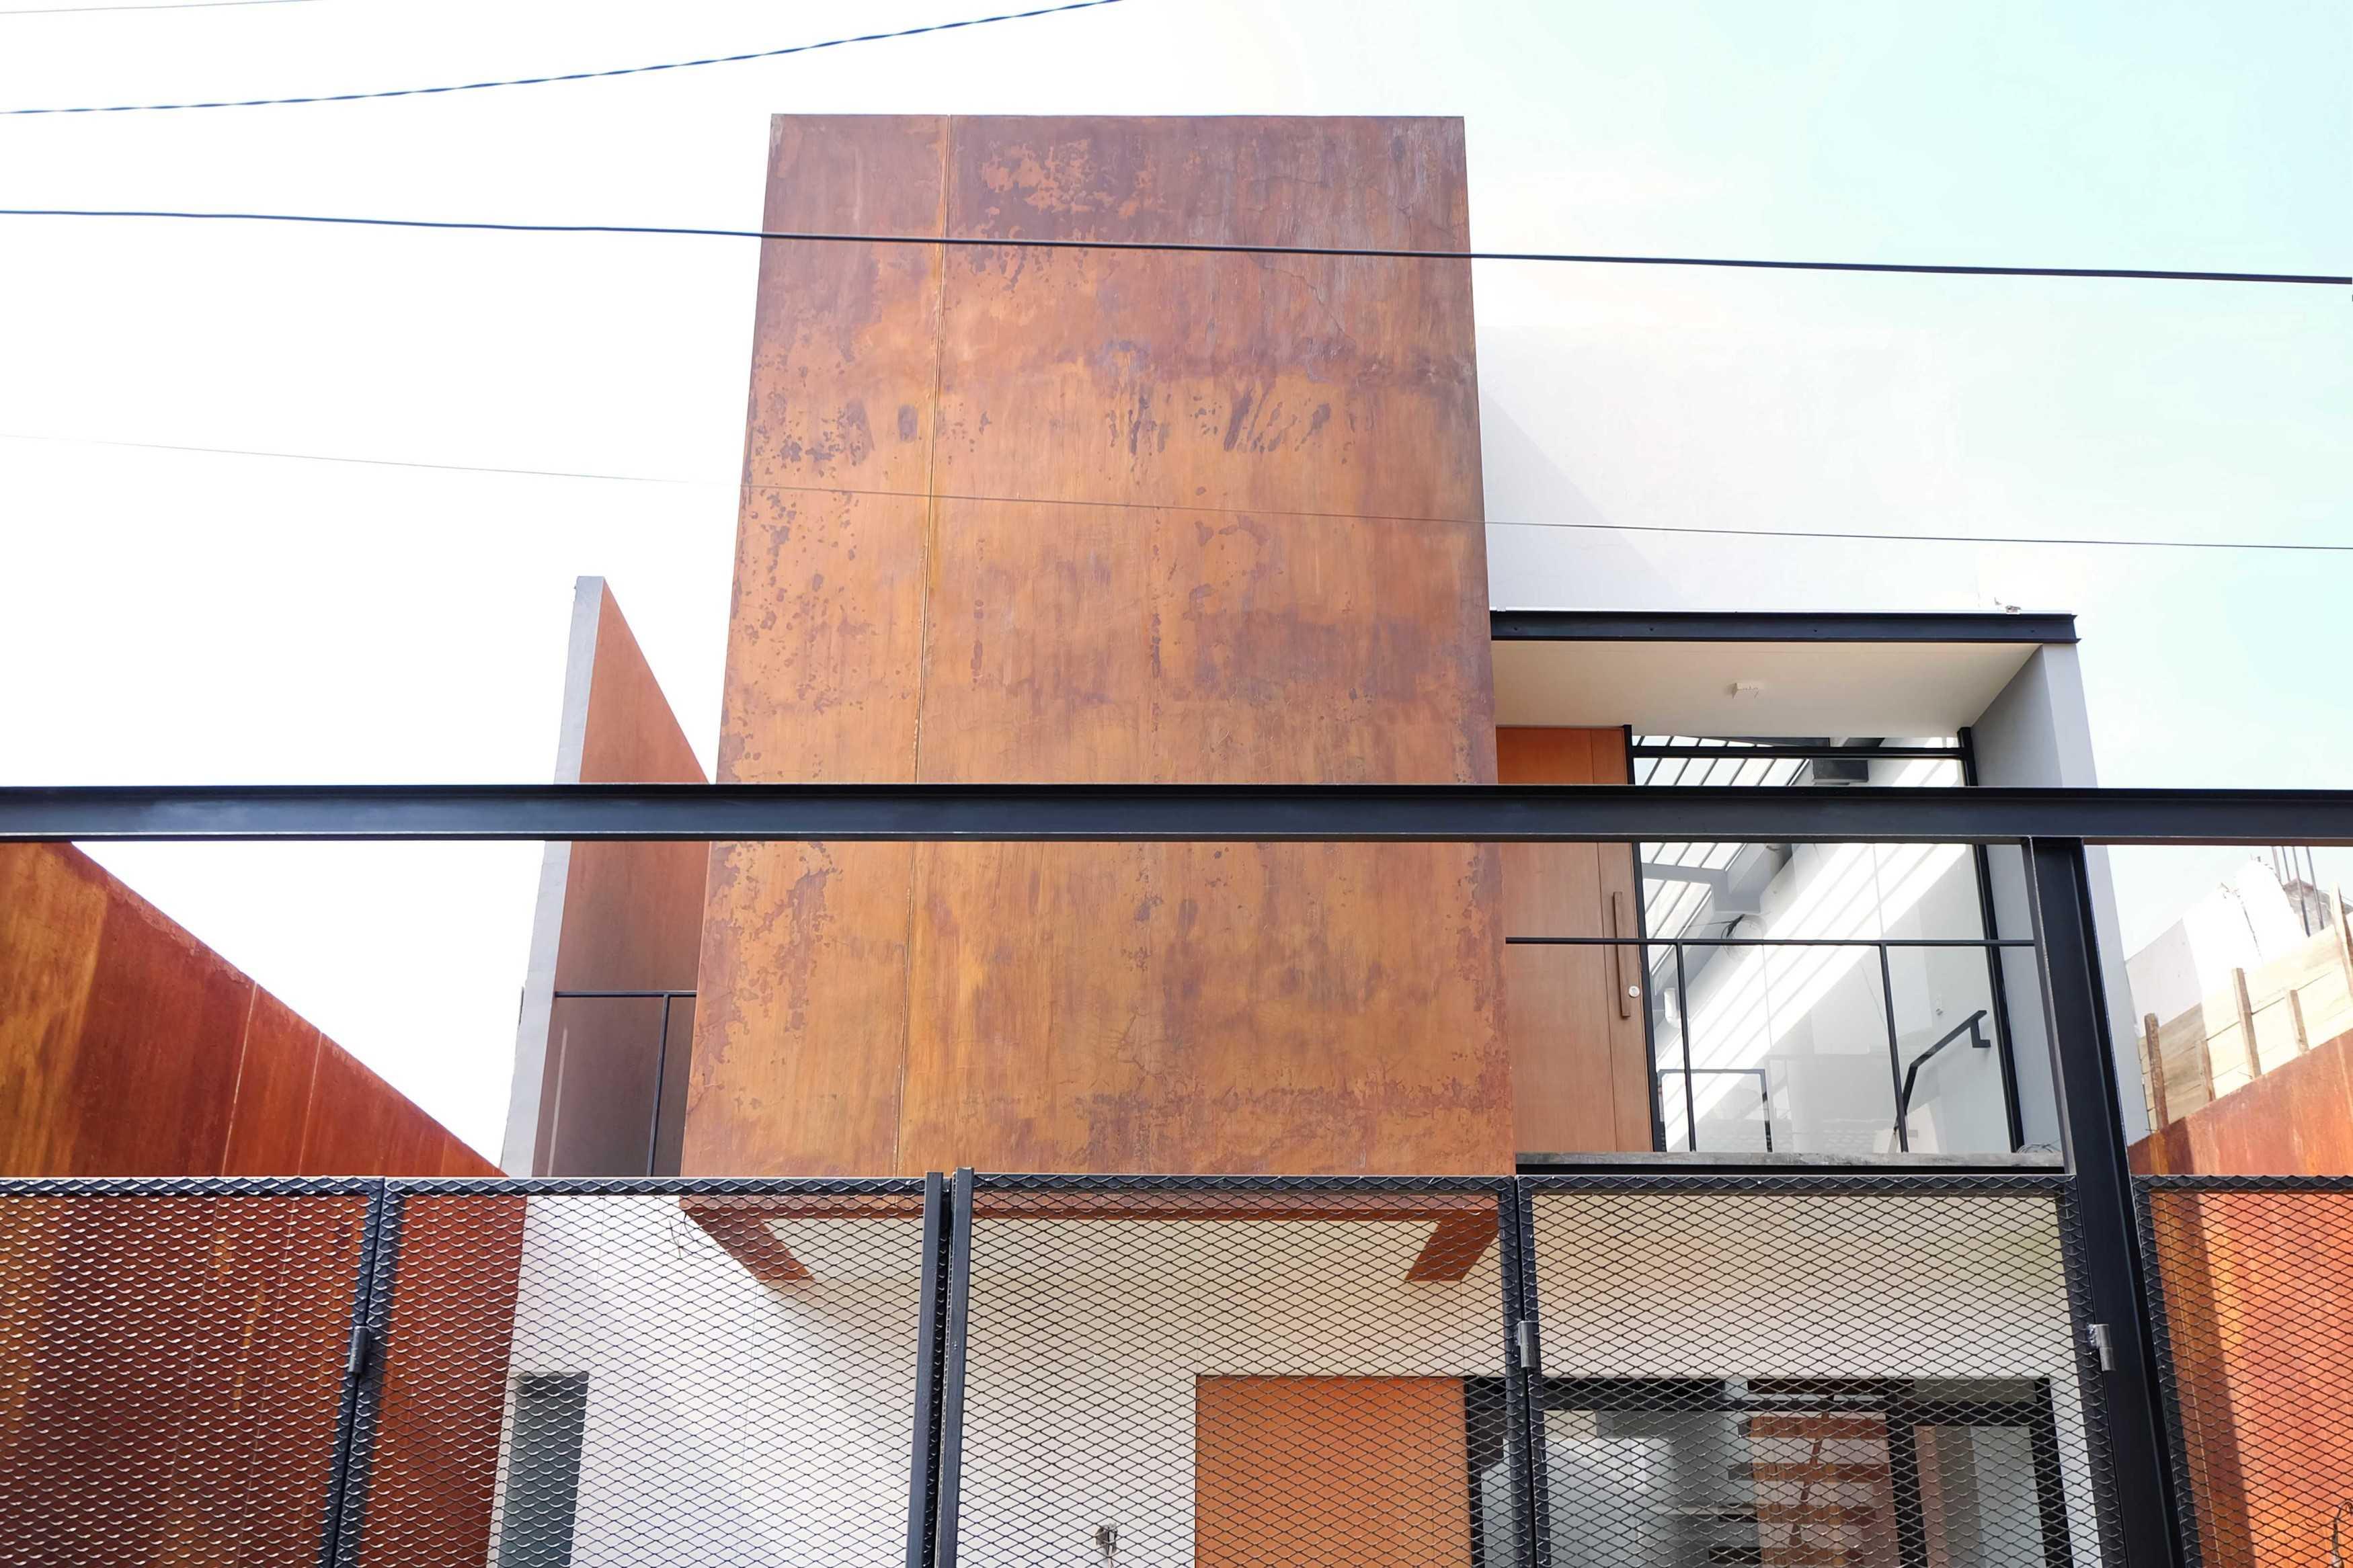 Dica Selaras 105 House Antapani, Kota Bandung, Jawa Barat, Indonesia Antapani, Kota Bandung, Jawa Barat, Indonesia Dica-Selaras-105-House   62318